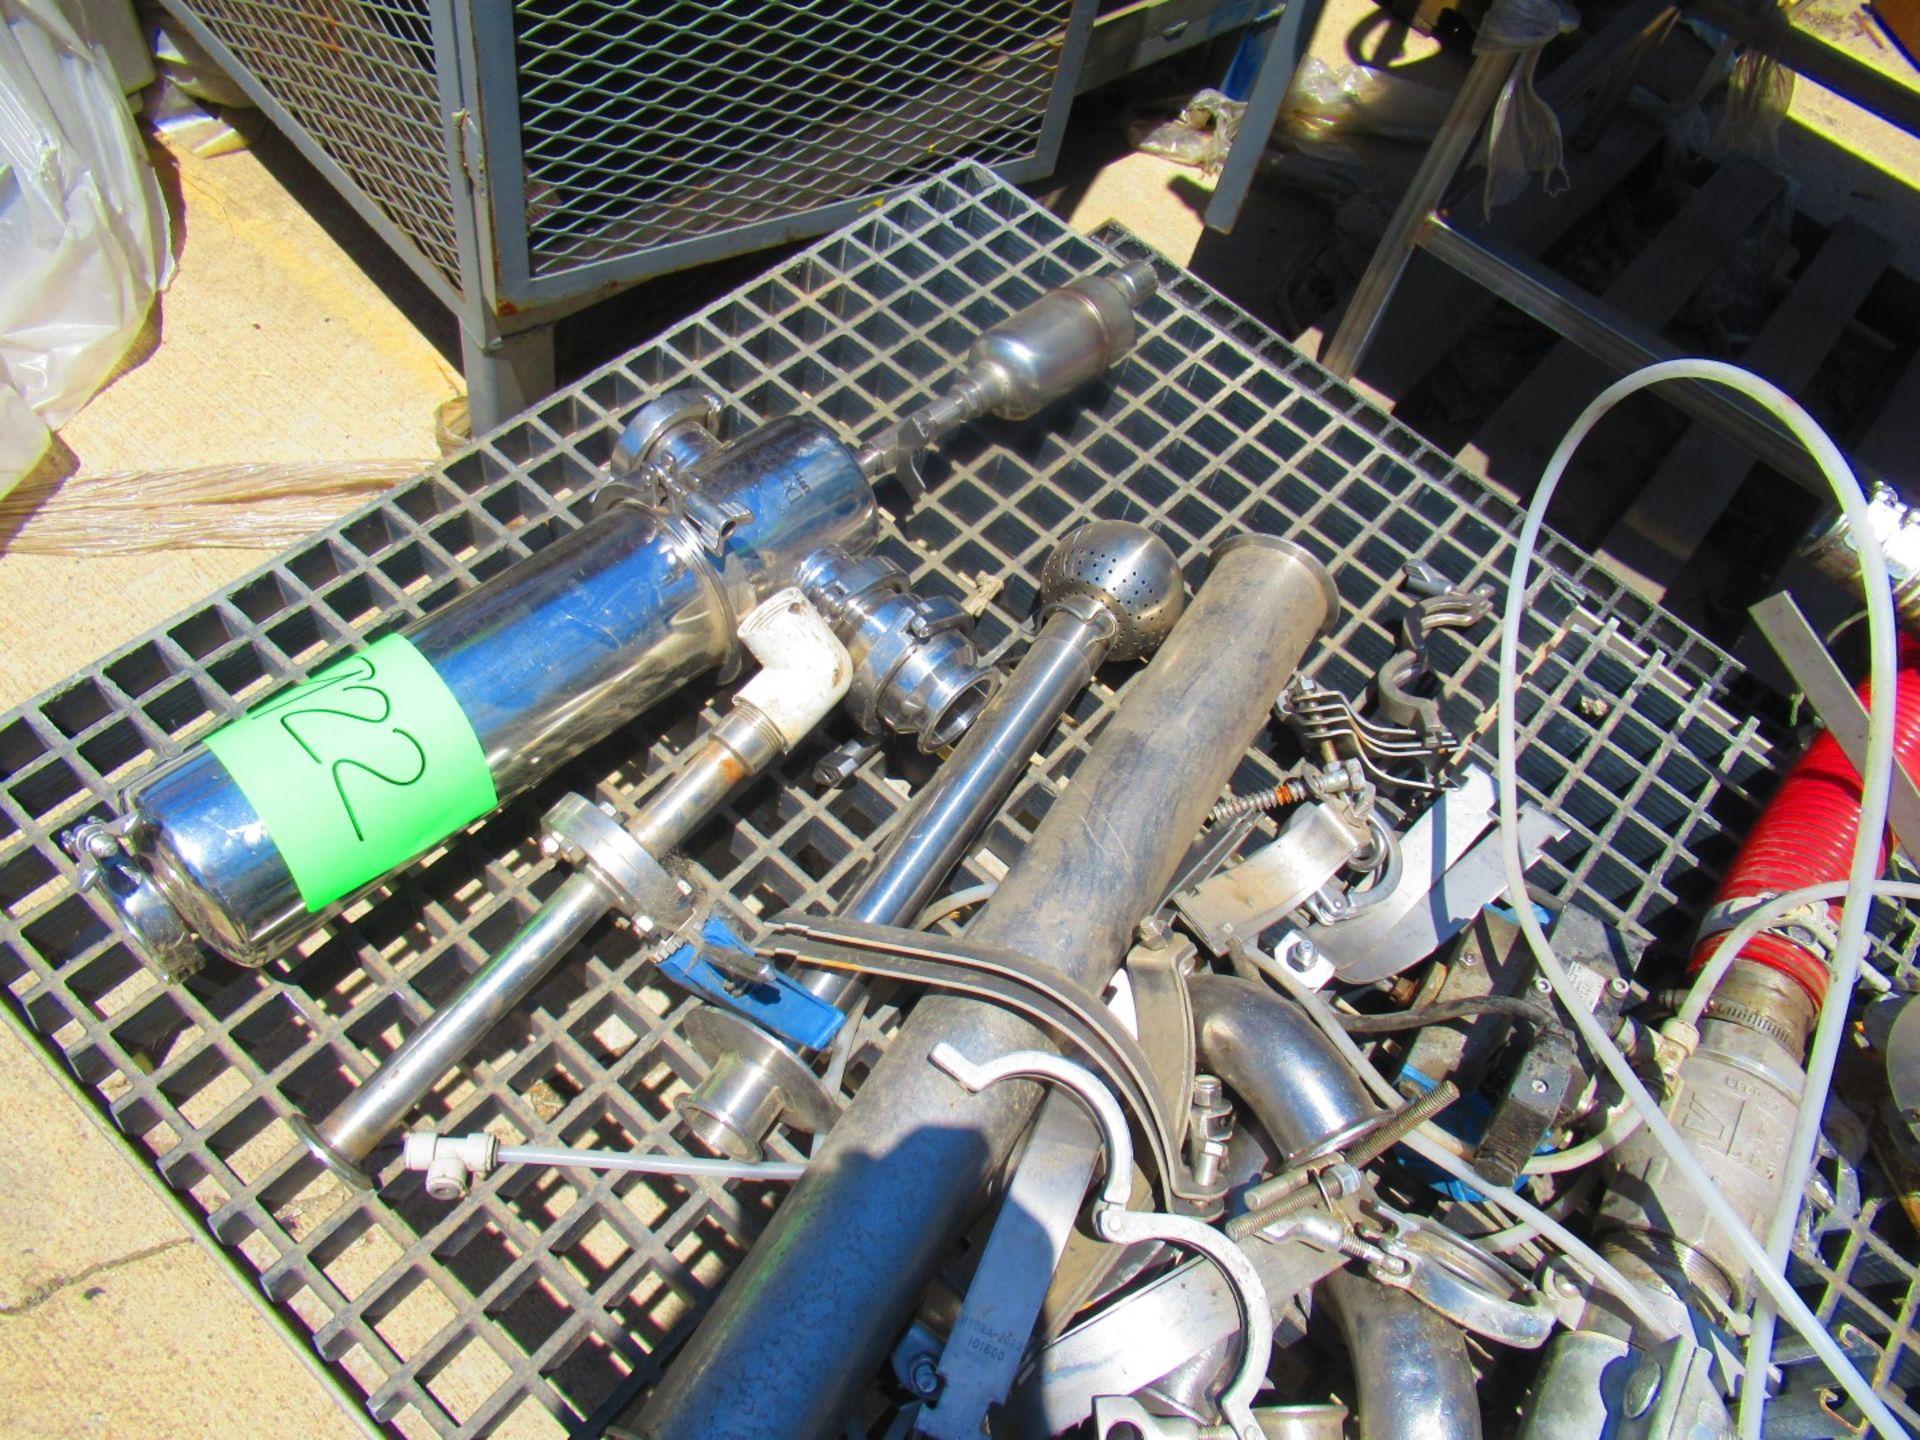 Sanitary Parts - Image 3 of 3